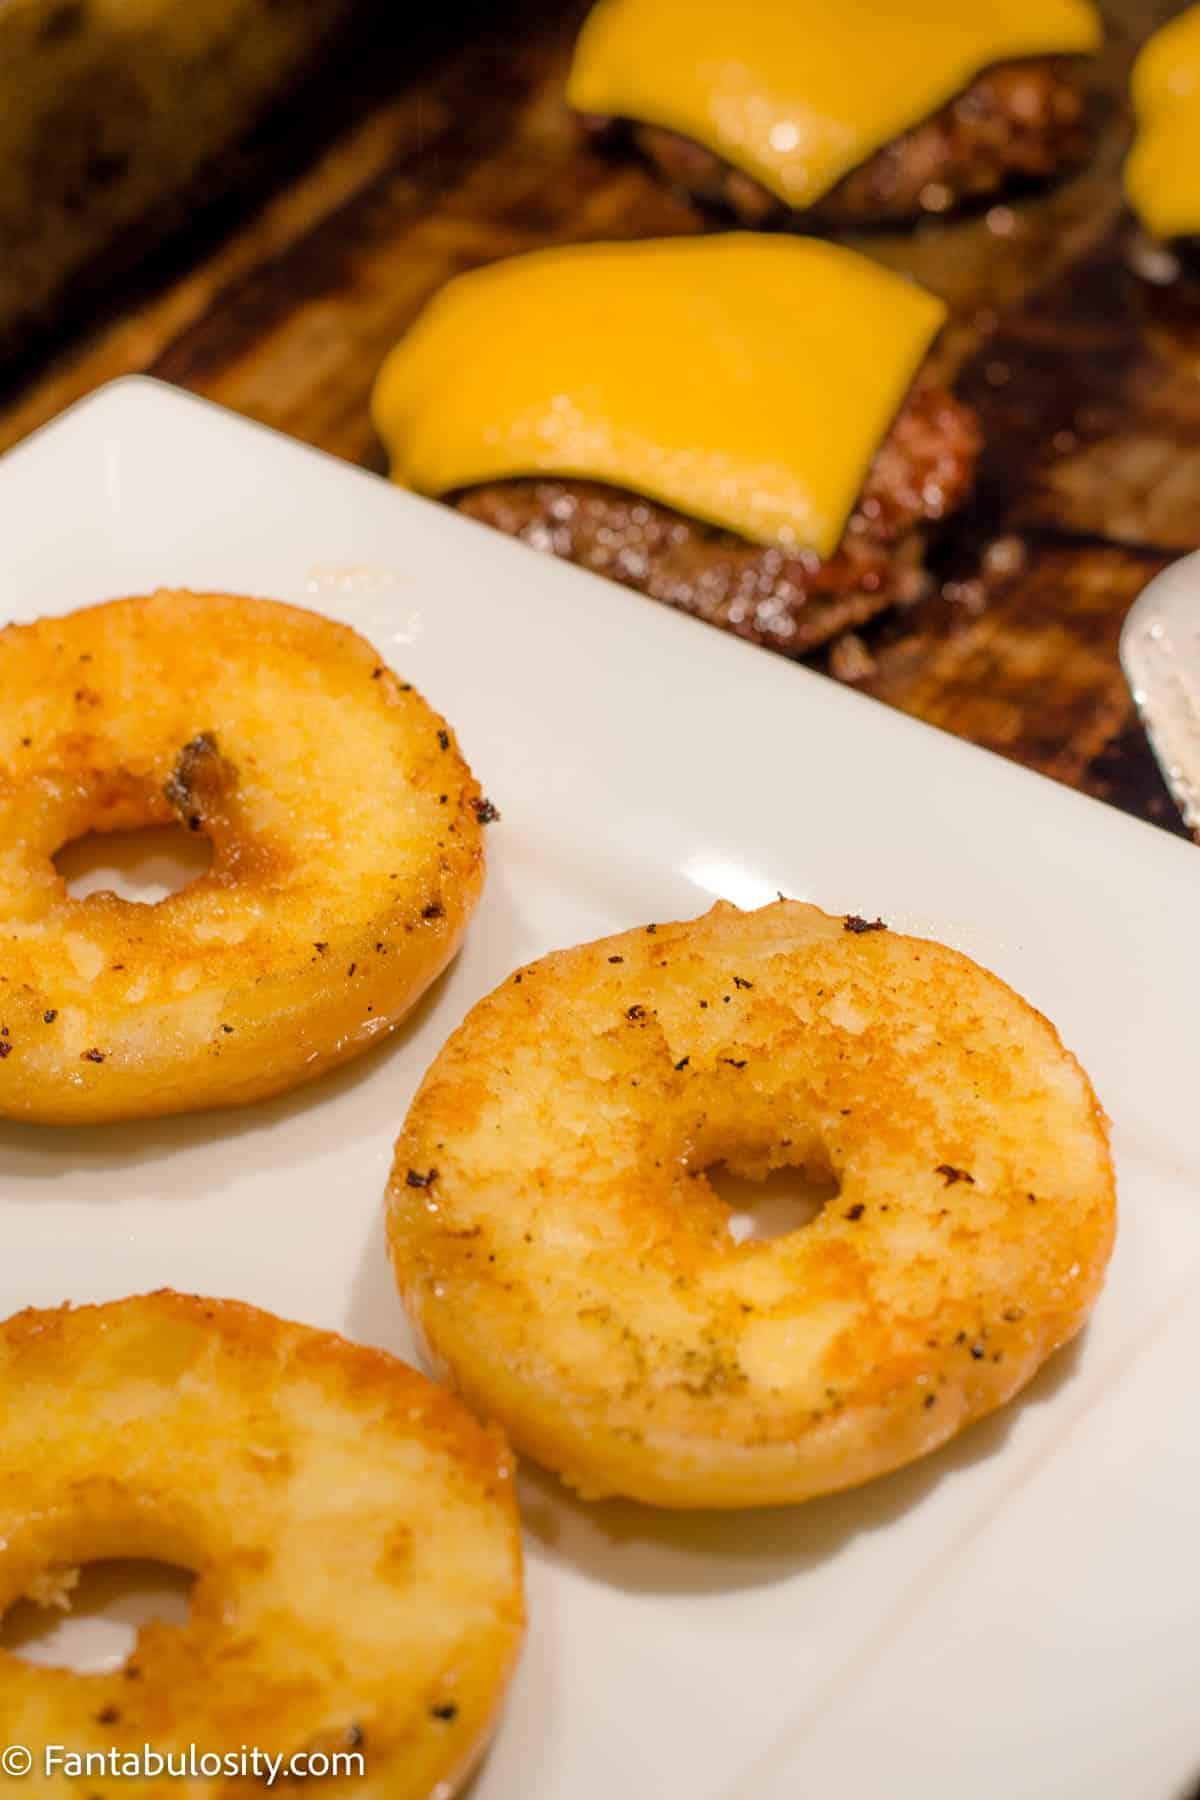 Toasted glazed donuts